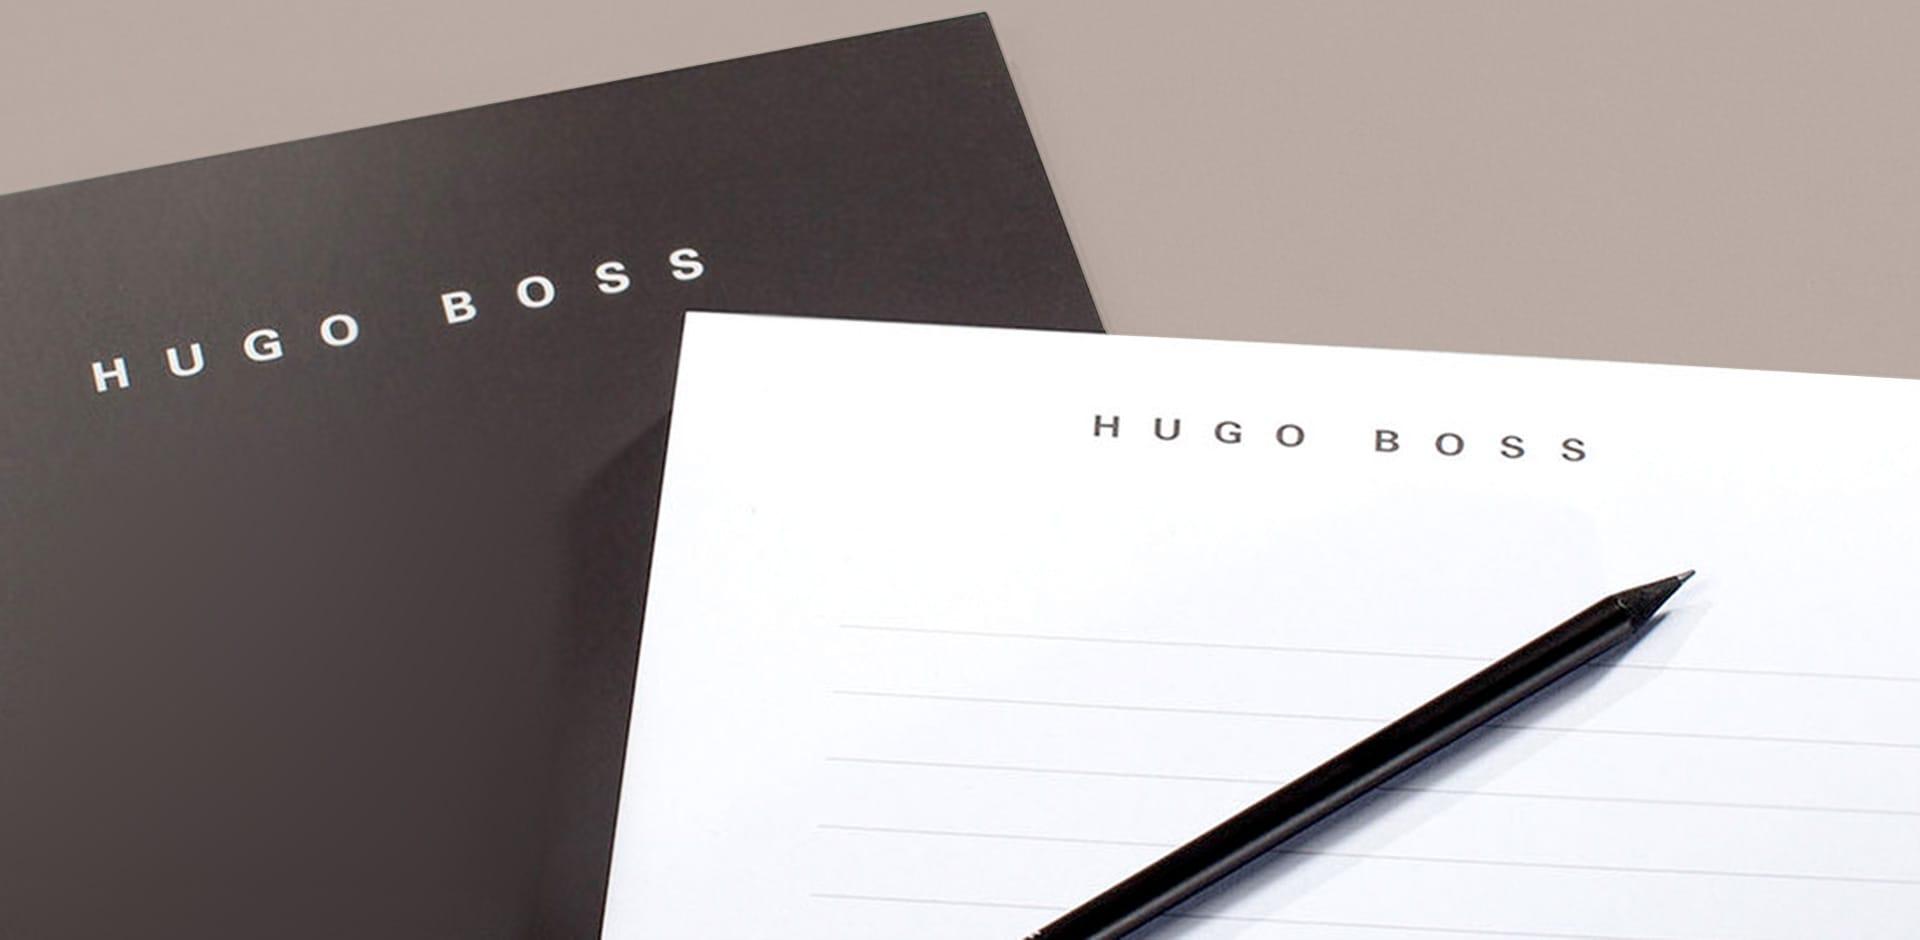 d33169f193fa History | HUGO BOSS Group